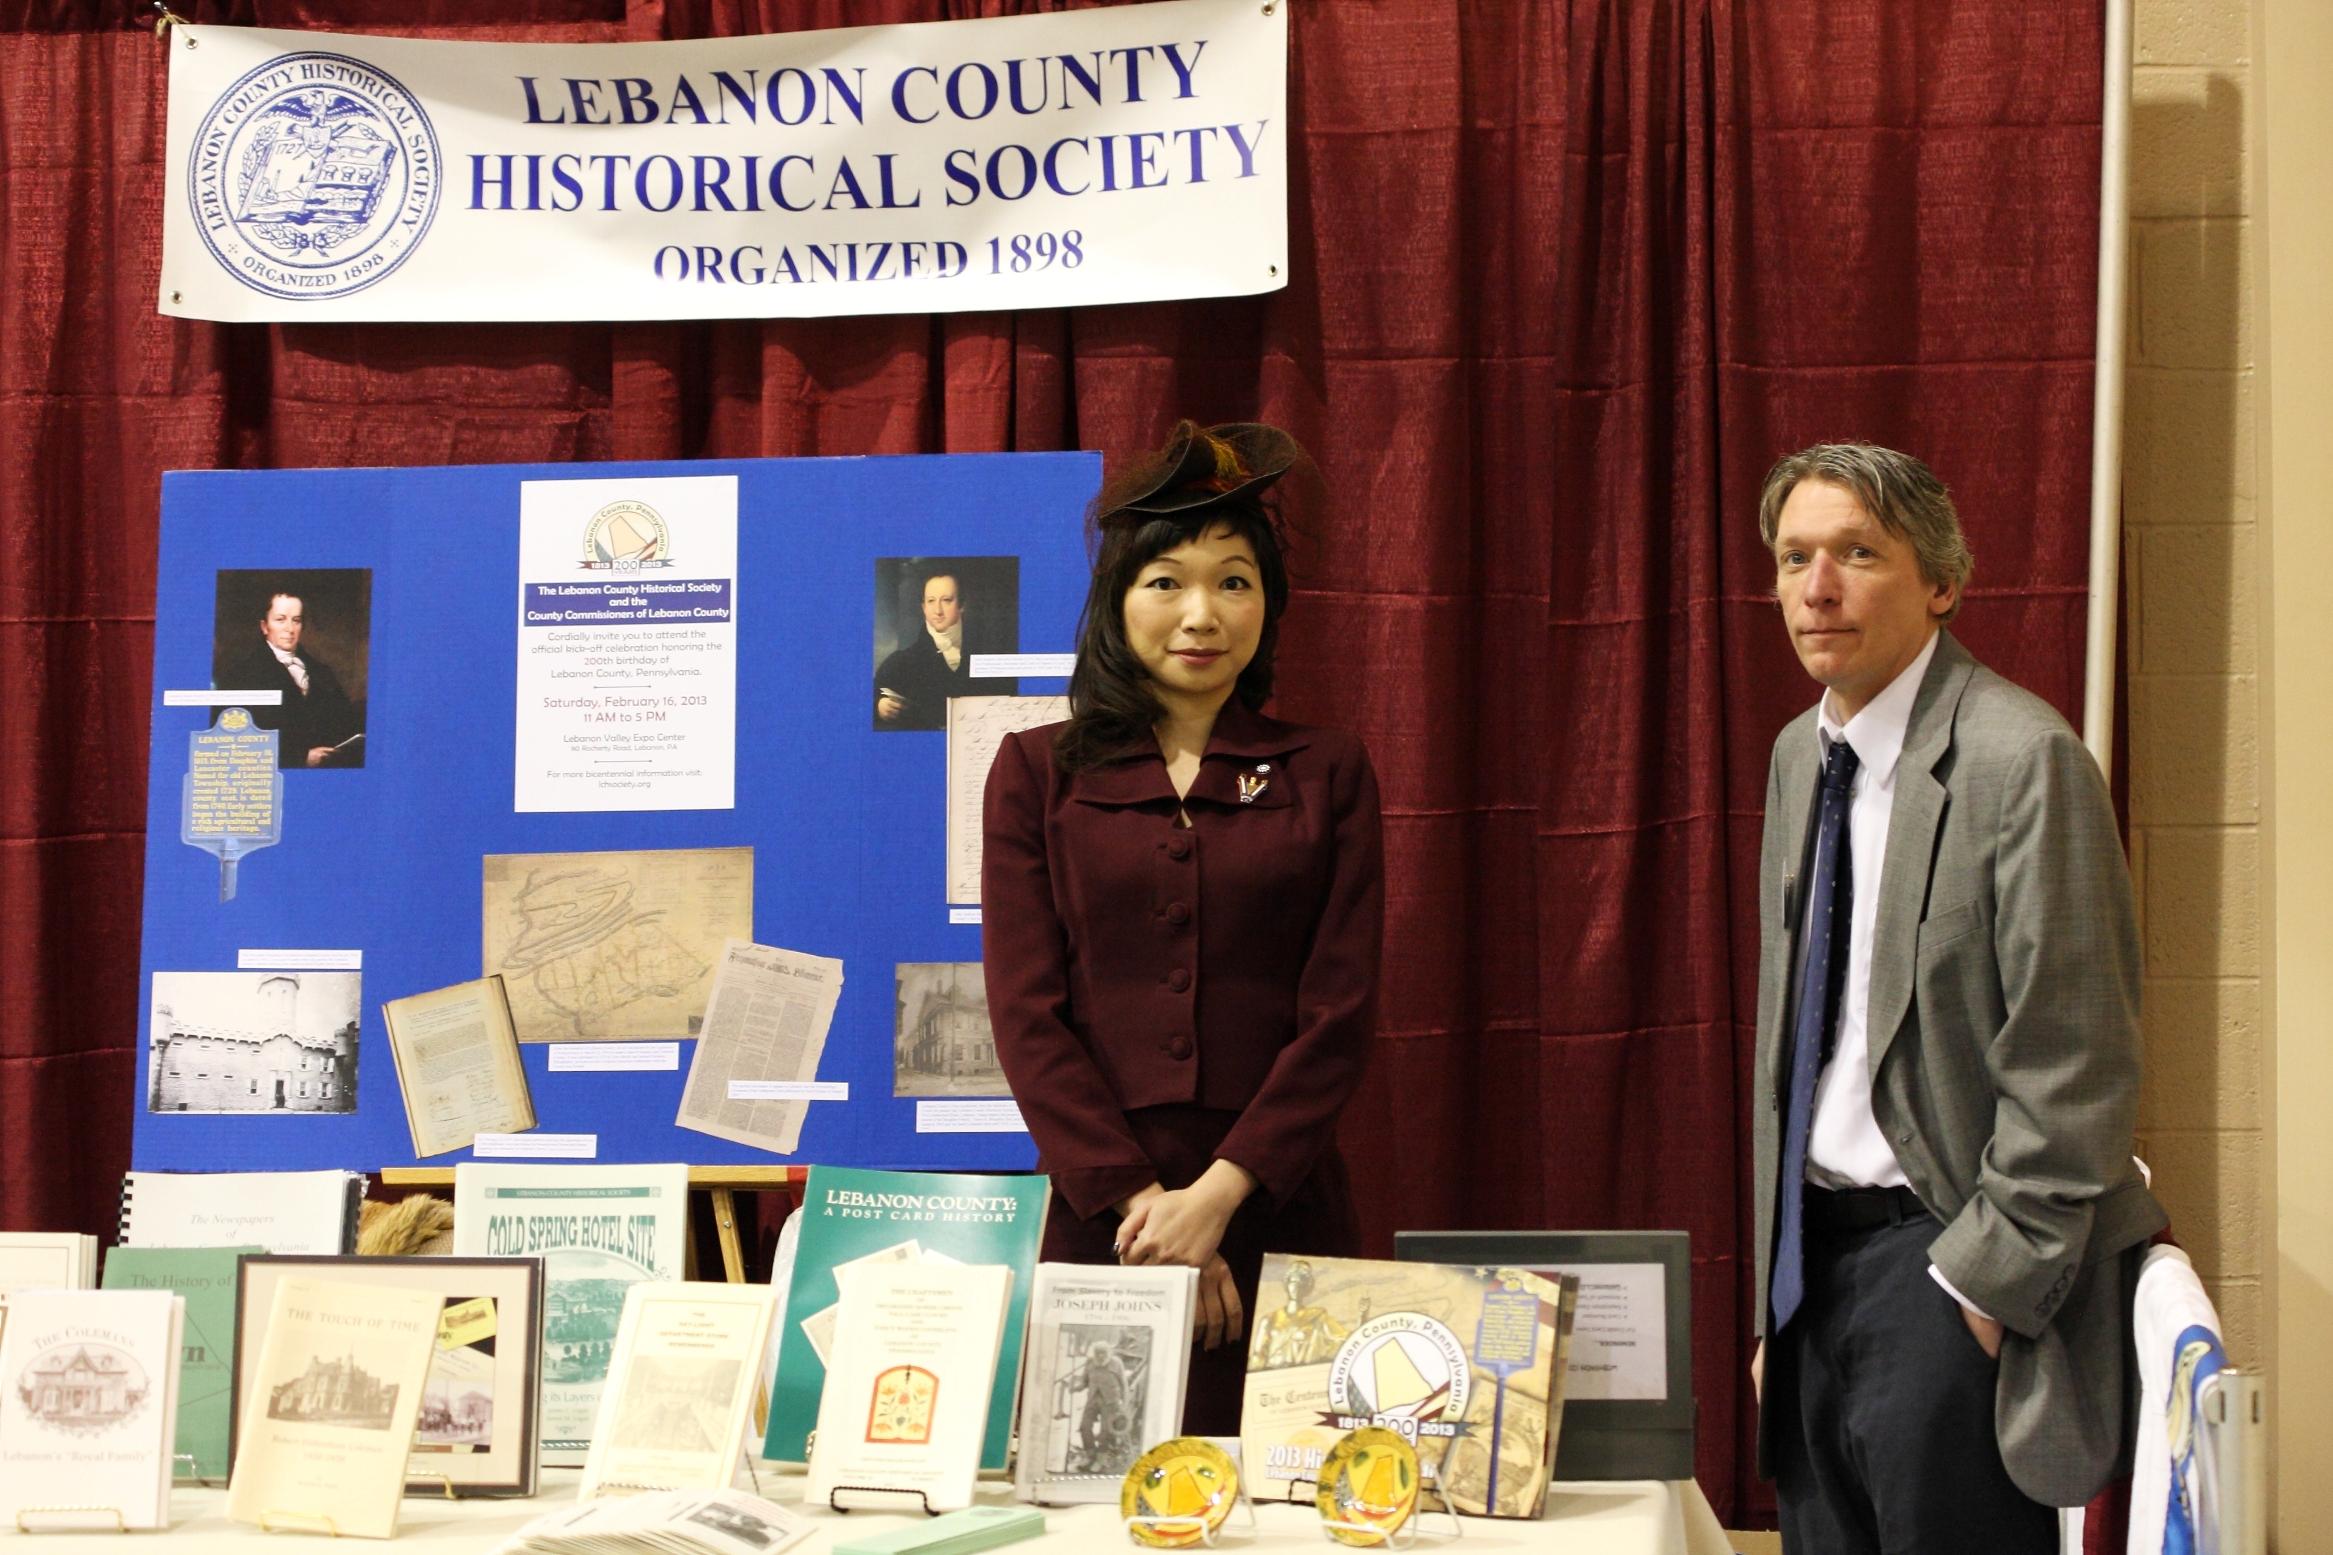 Tina Valgenti and Brian Kissler, LCHS Booth Bicentennial 2-16-2013